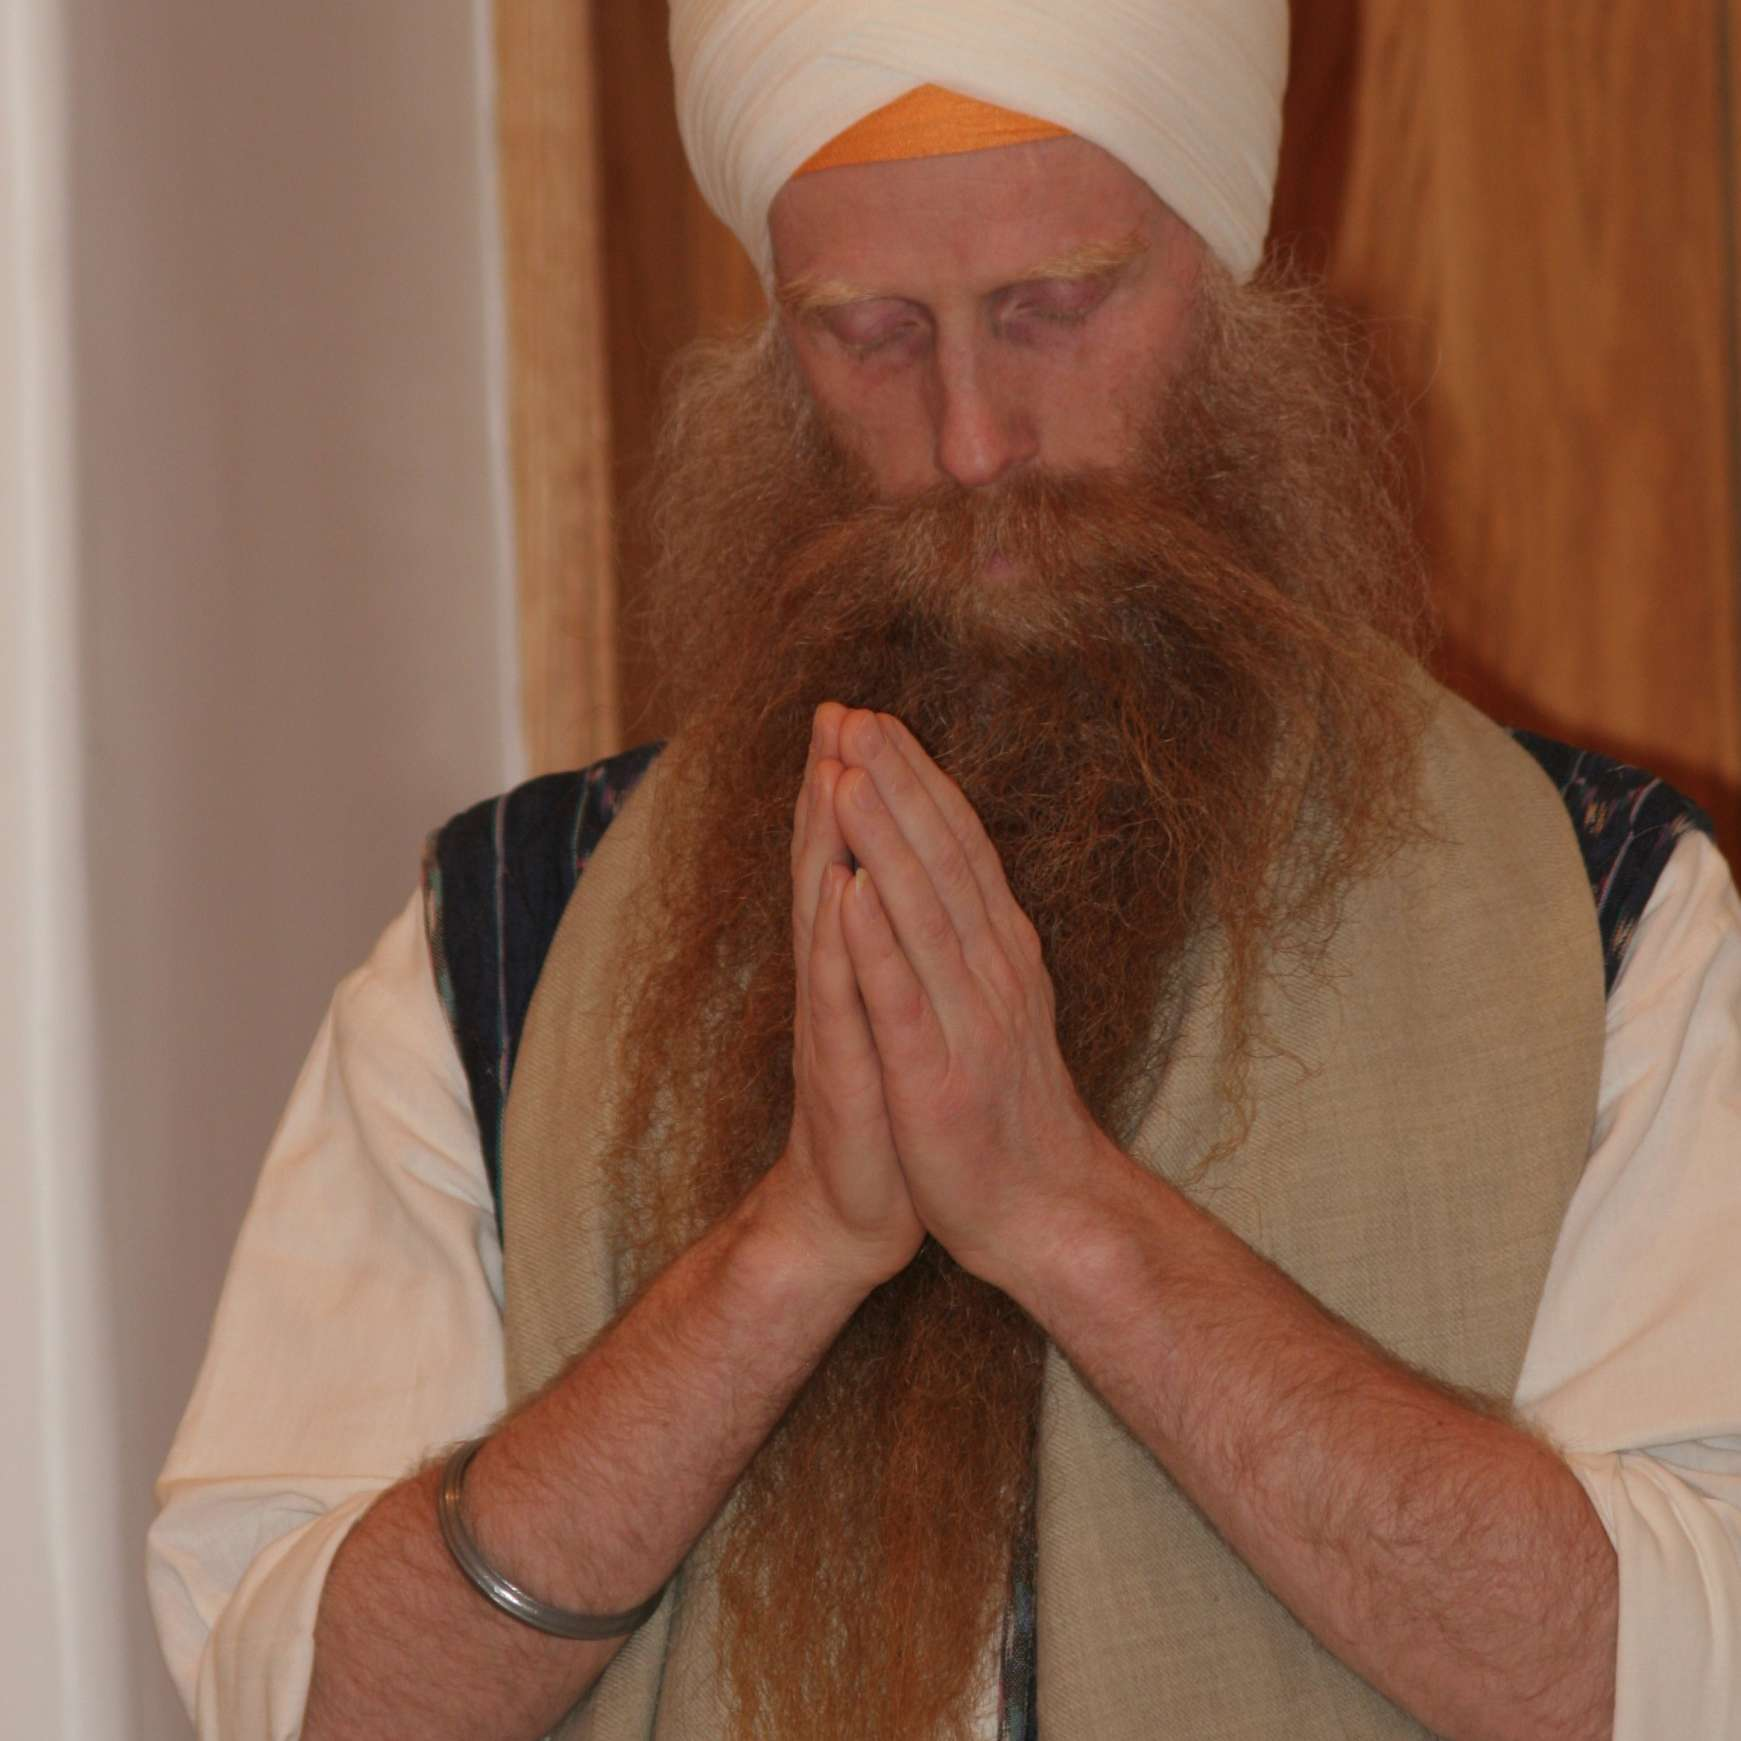 Sikh Man With Kes, Uncut Hair and Beard